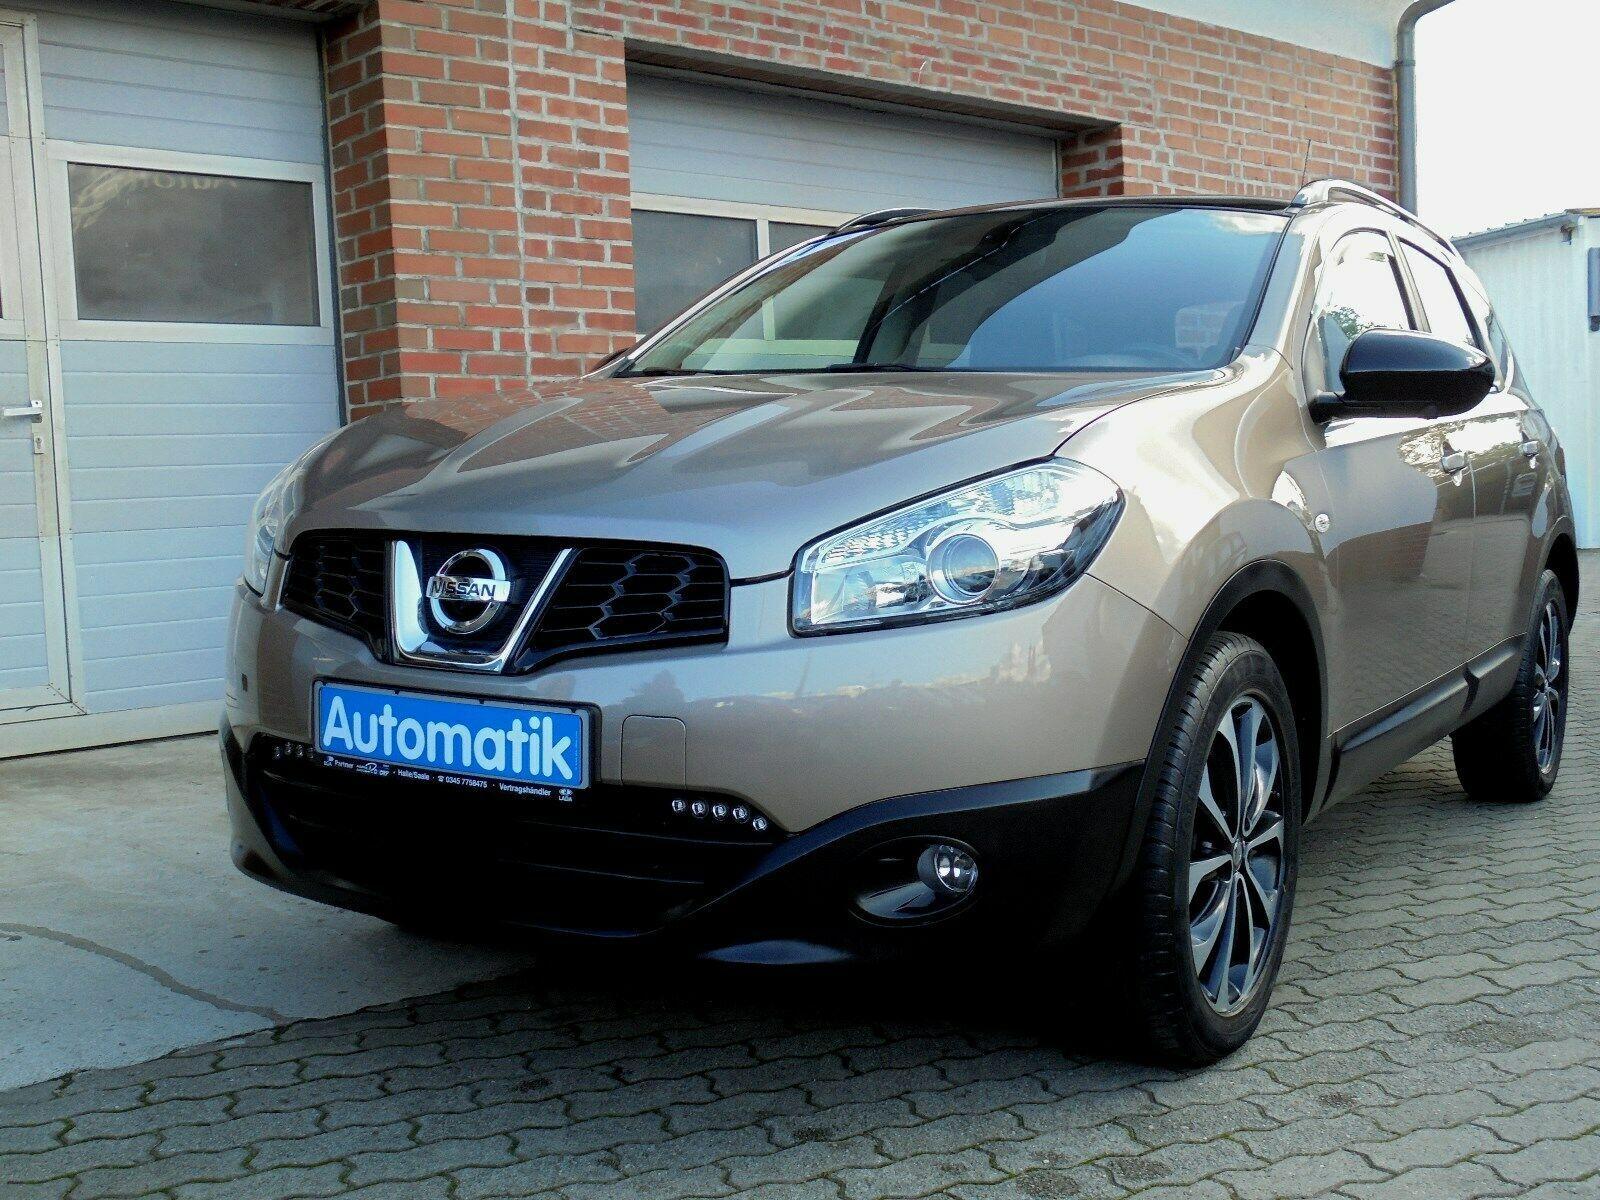 Nissan Qashqai+2 2.0 Automatik